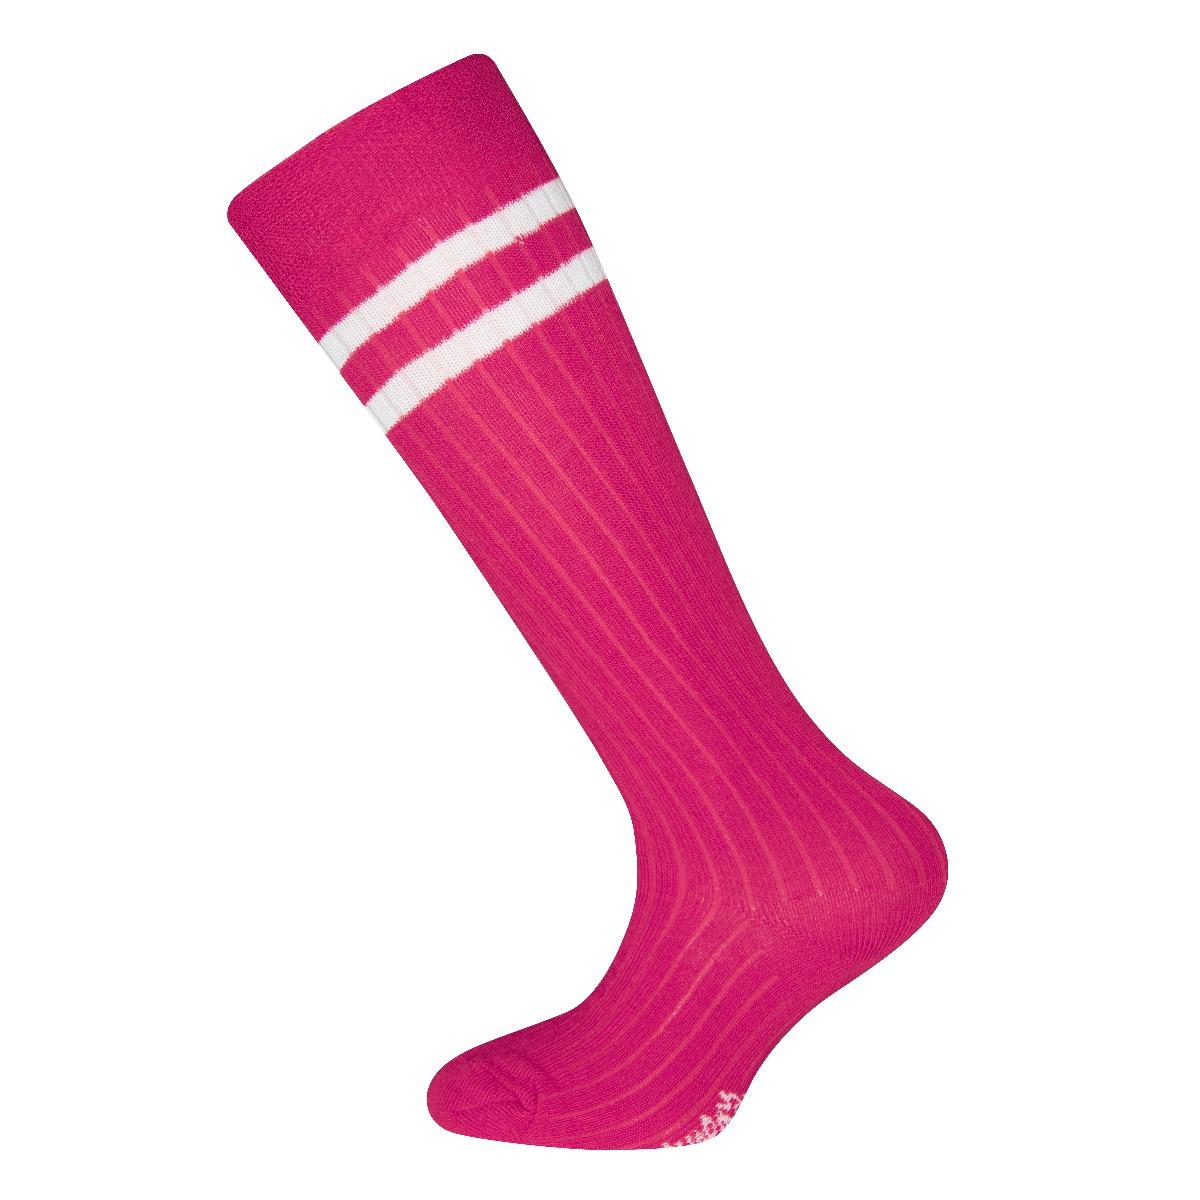 Ewers Kniekousen met rib motief 2 strepen-39/42-Pink